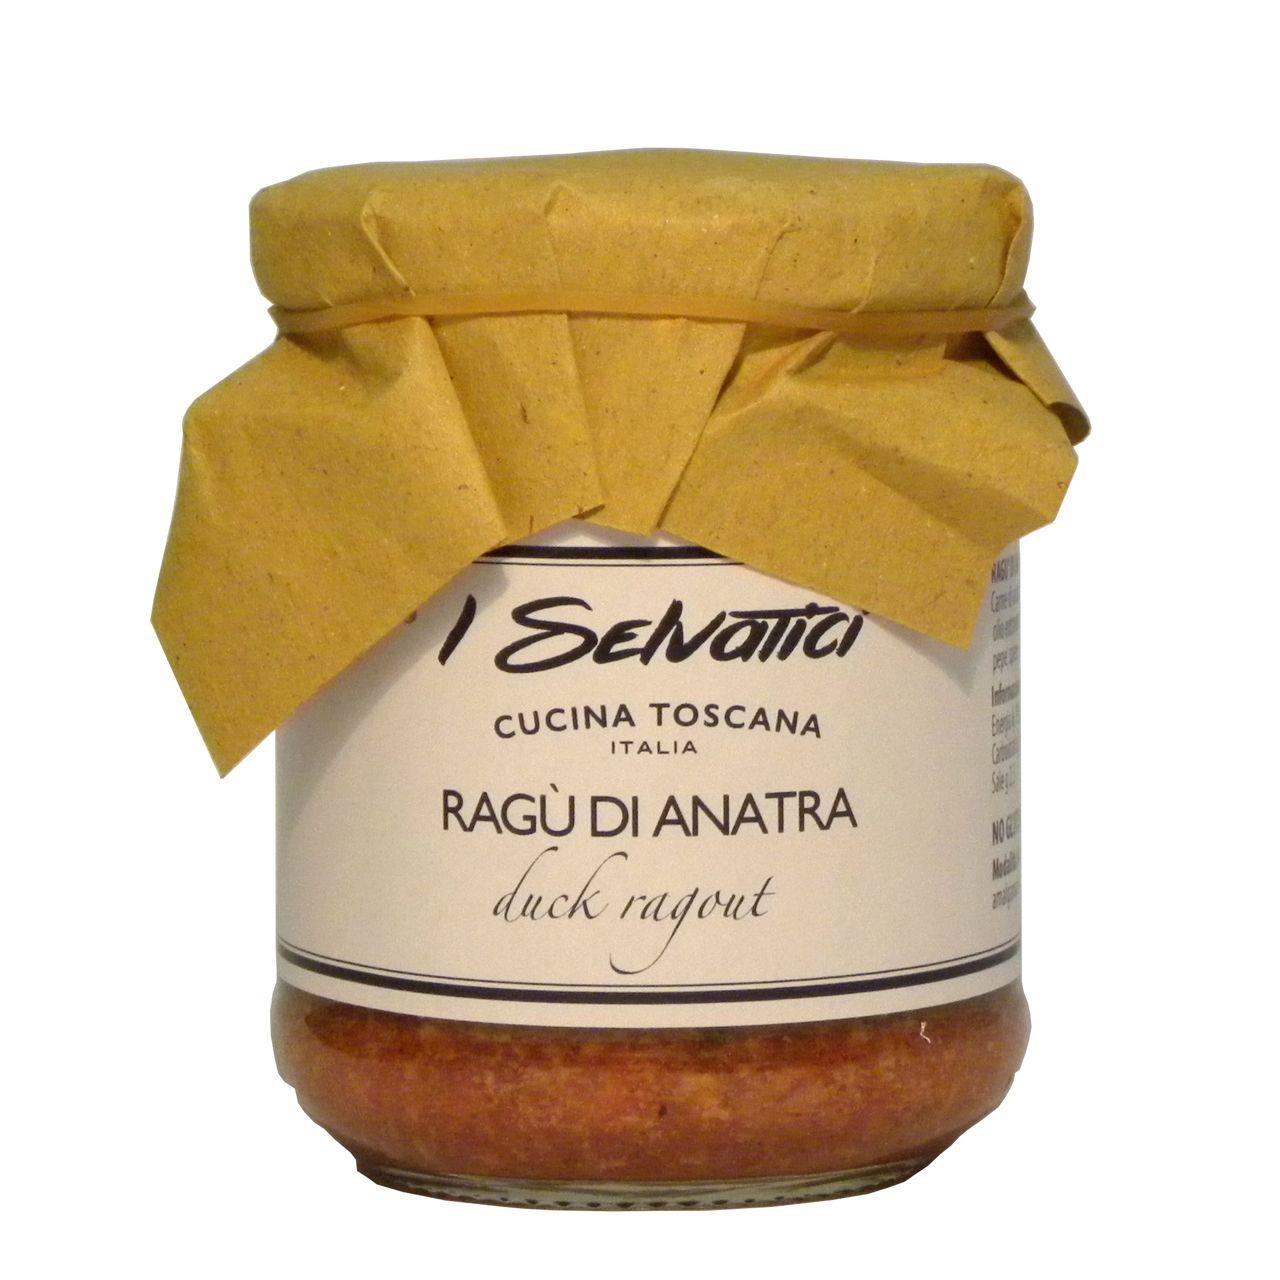 Ragù anatra – Duck ragù – Gustorotondo – Italian Food Boutique